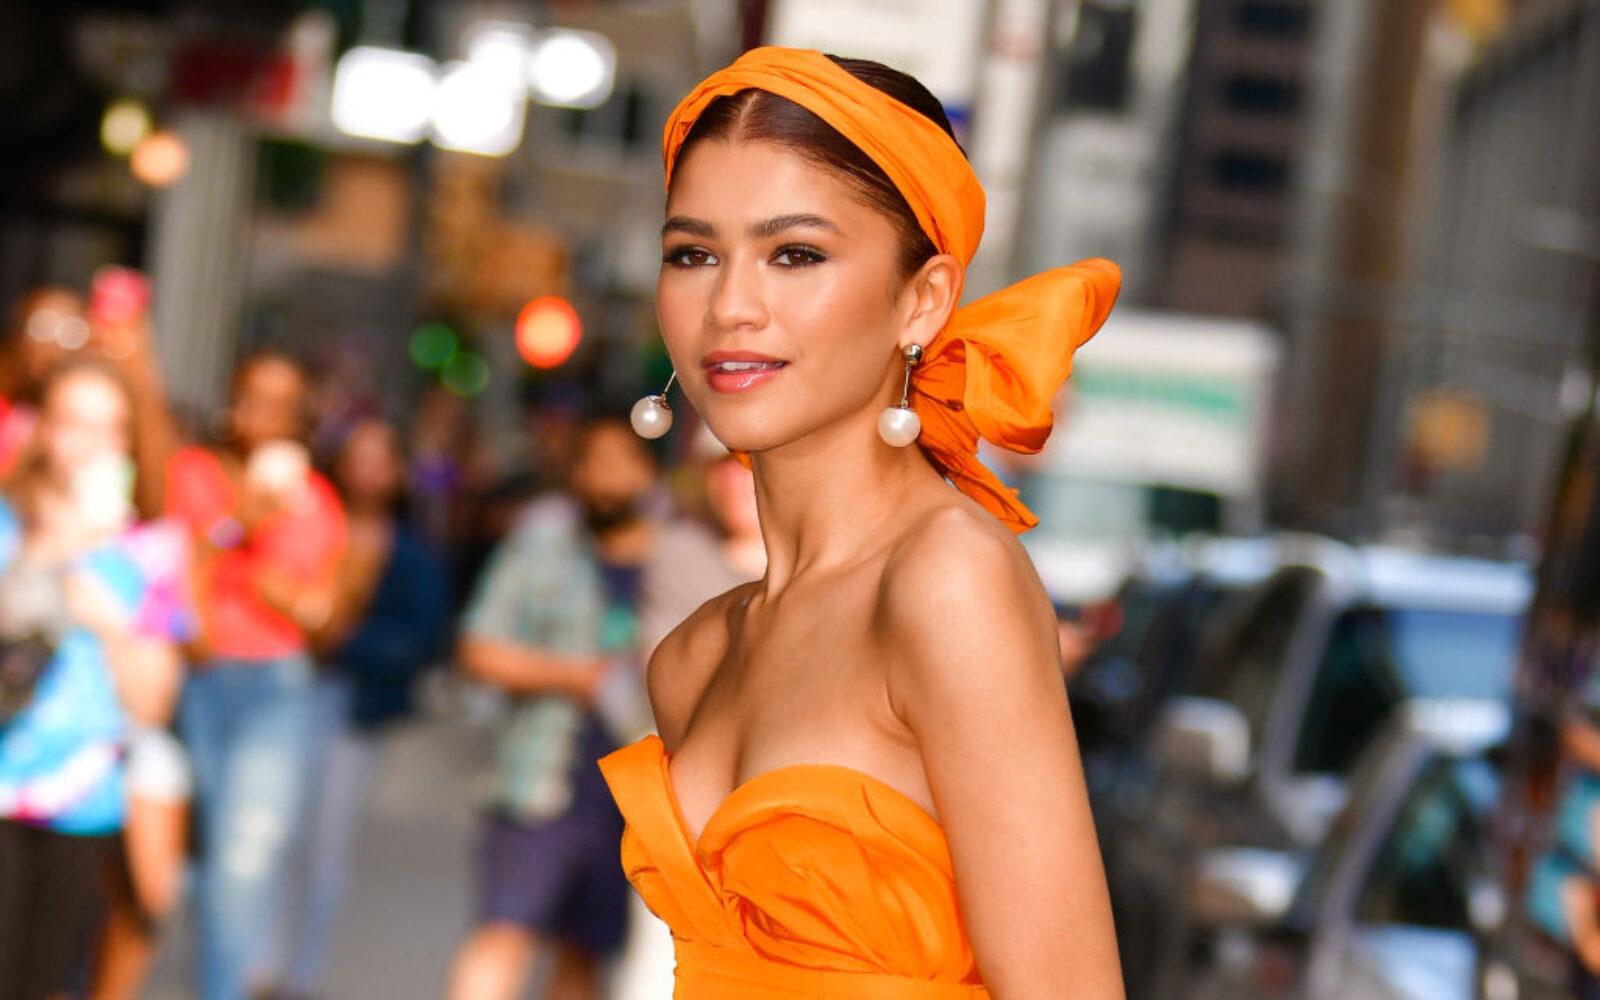 MOJEH Best Dressed - Zendaya in Carolina Herrera